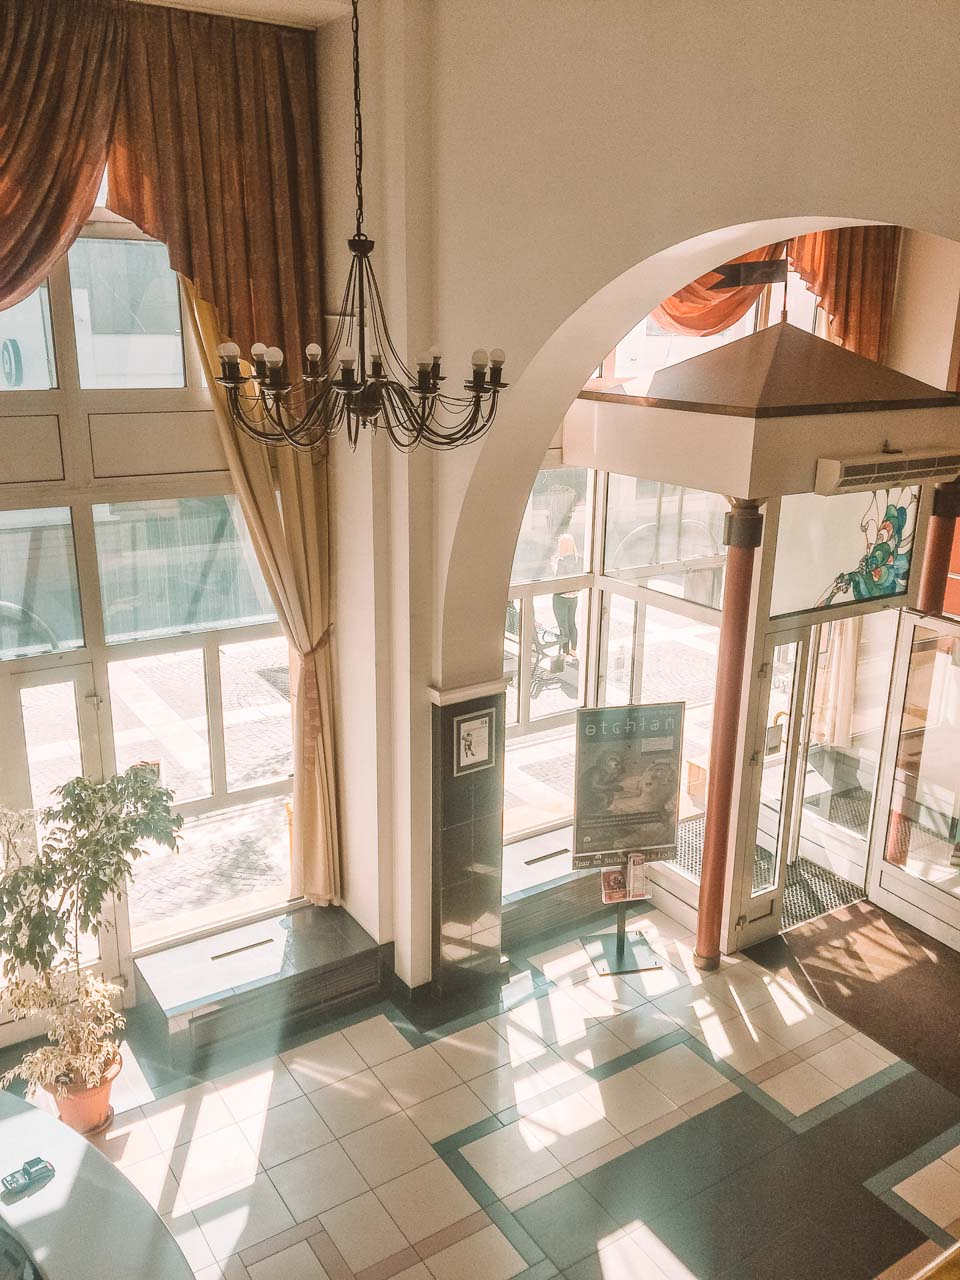 The foyer of Hotel Savoy in Łódź, Poland